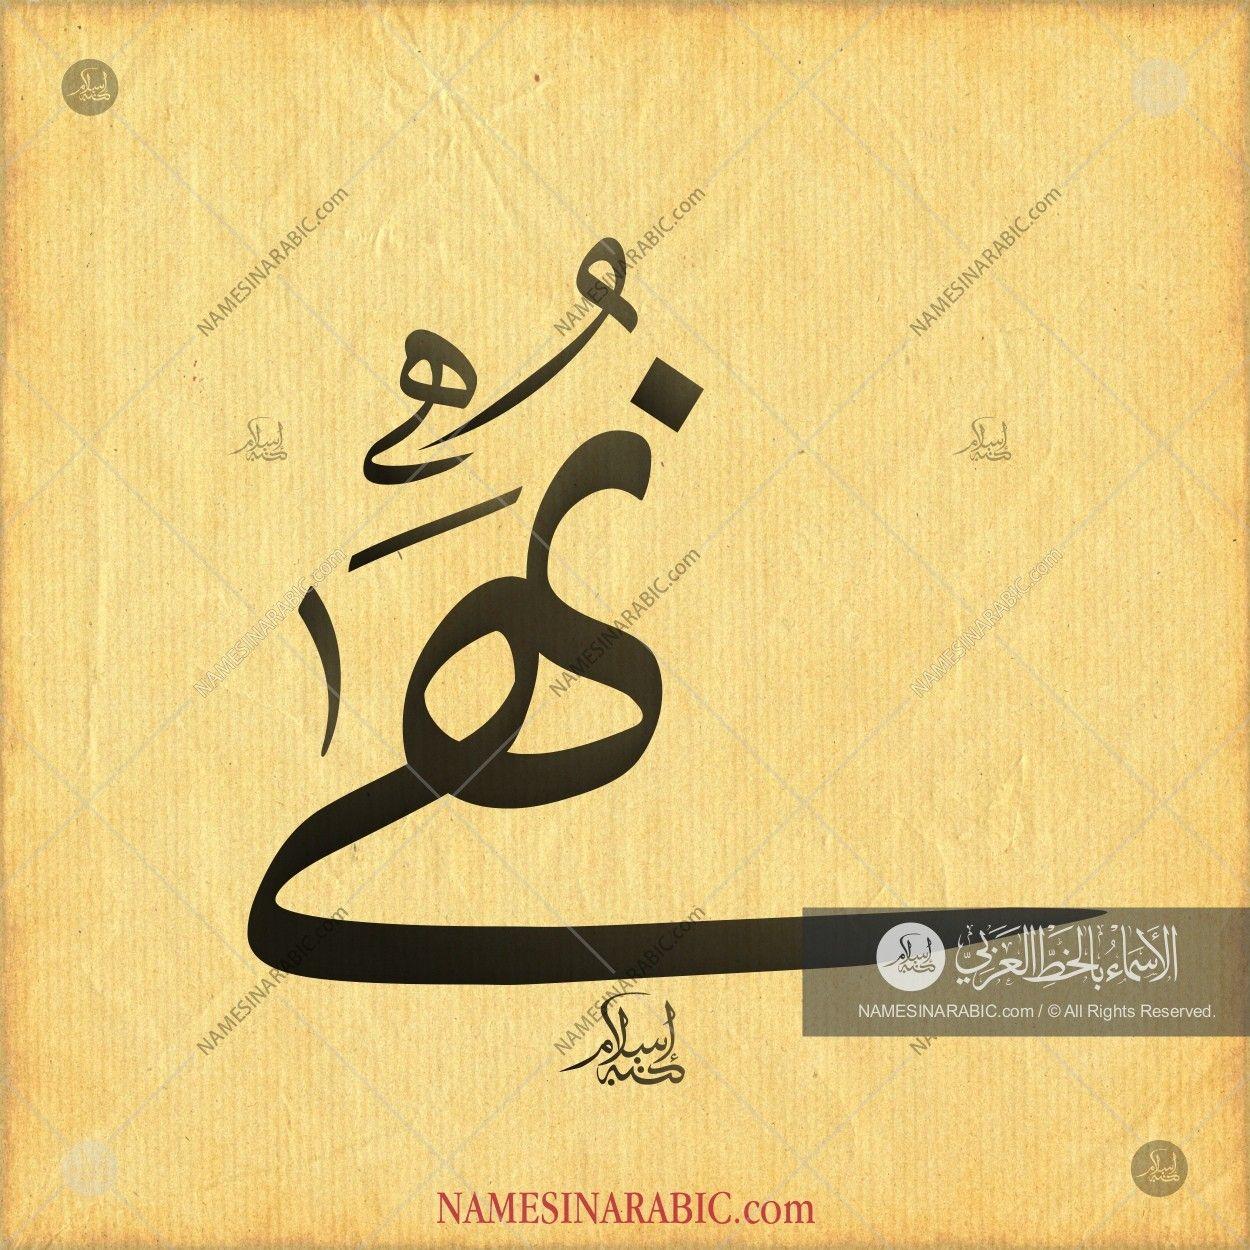 Nuha نهى Names In Arabic Calligraphy Name 3169 Calligraphy Name Calligraphy Arabic Calligraphy Design